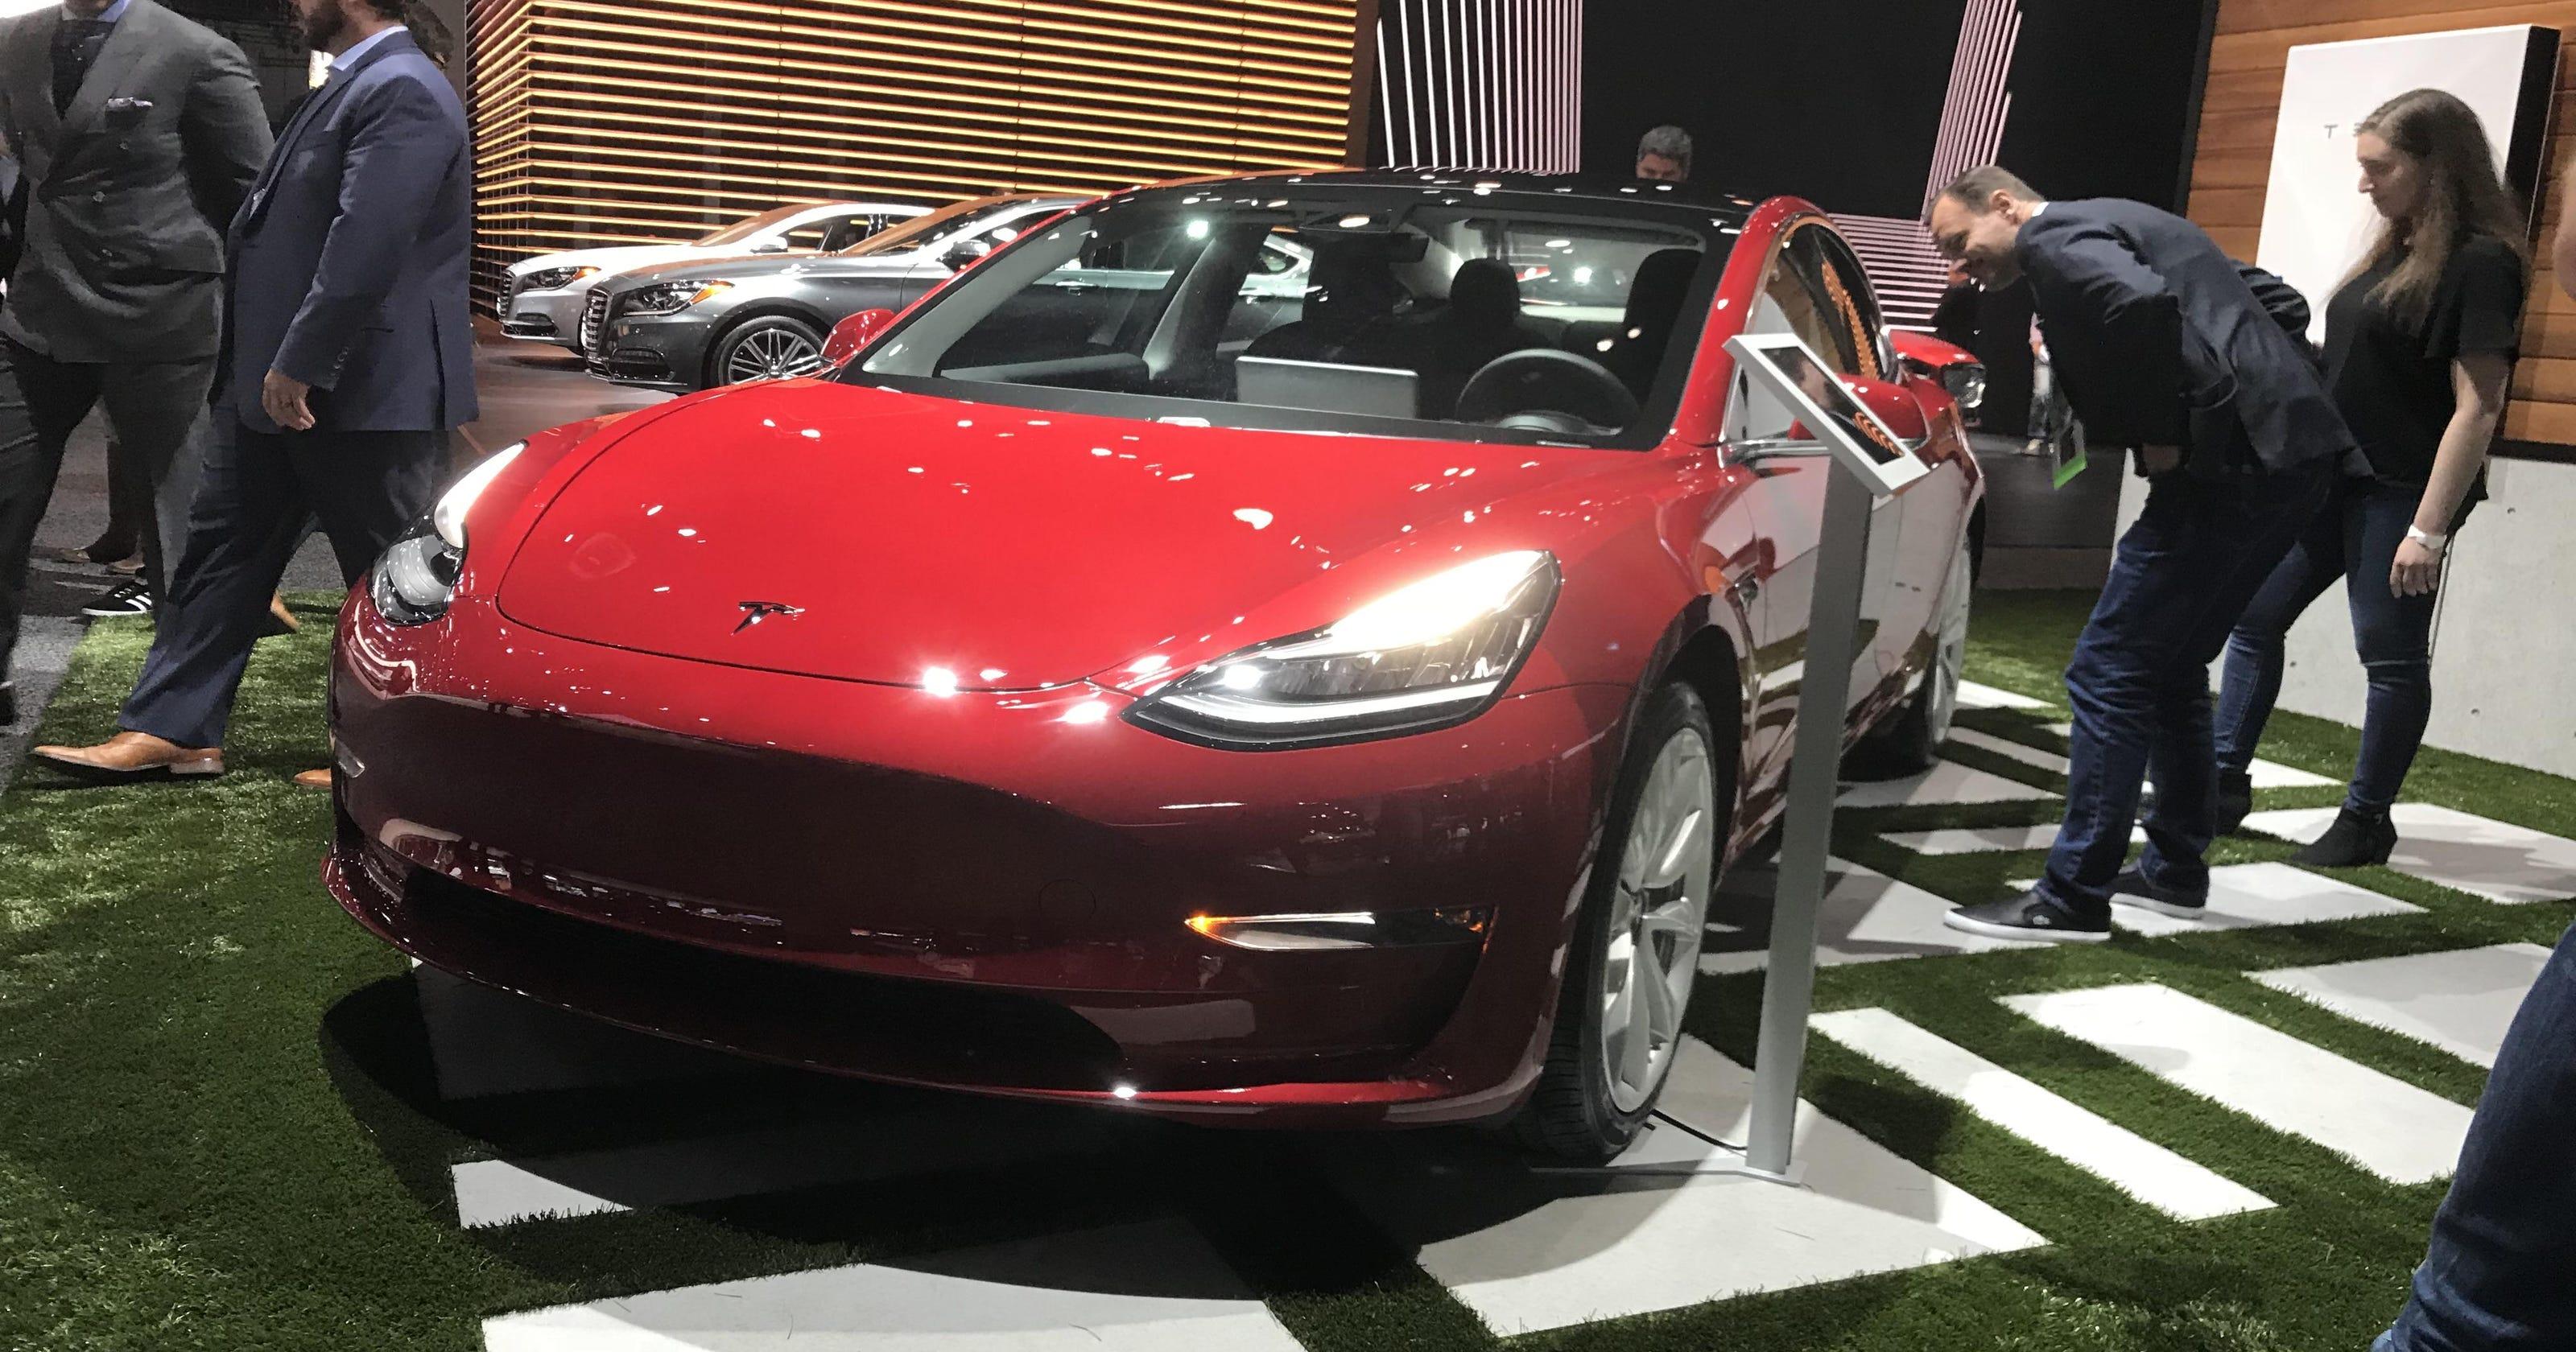 Tesla Generates Buzz As Electrics Rule La Show